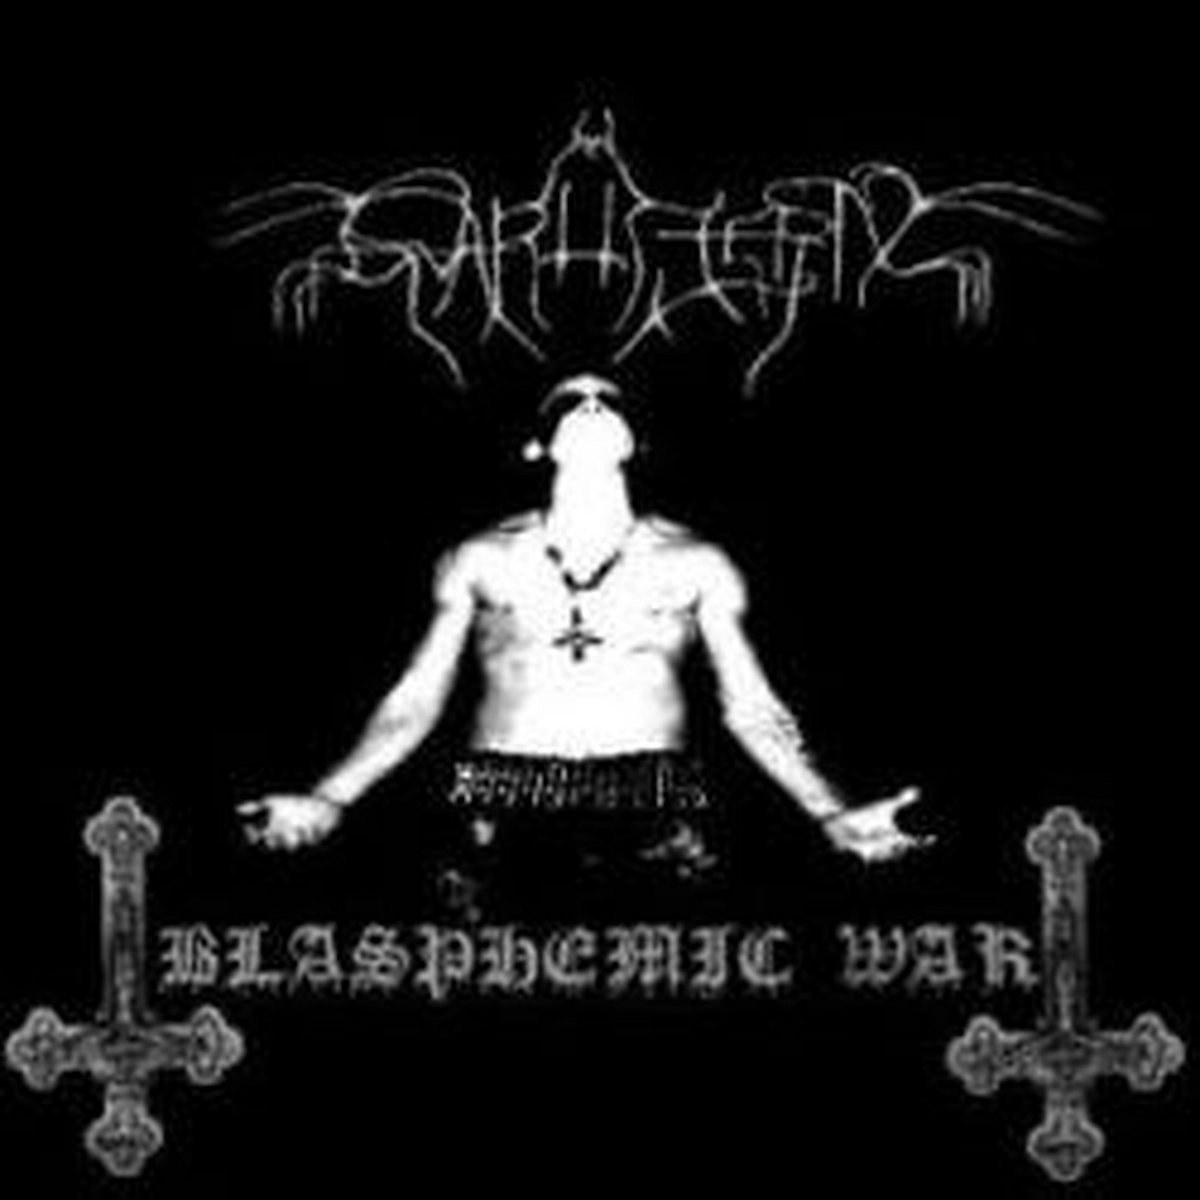 Reviews for Svarttjern - Blasphemic War